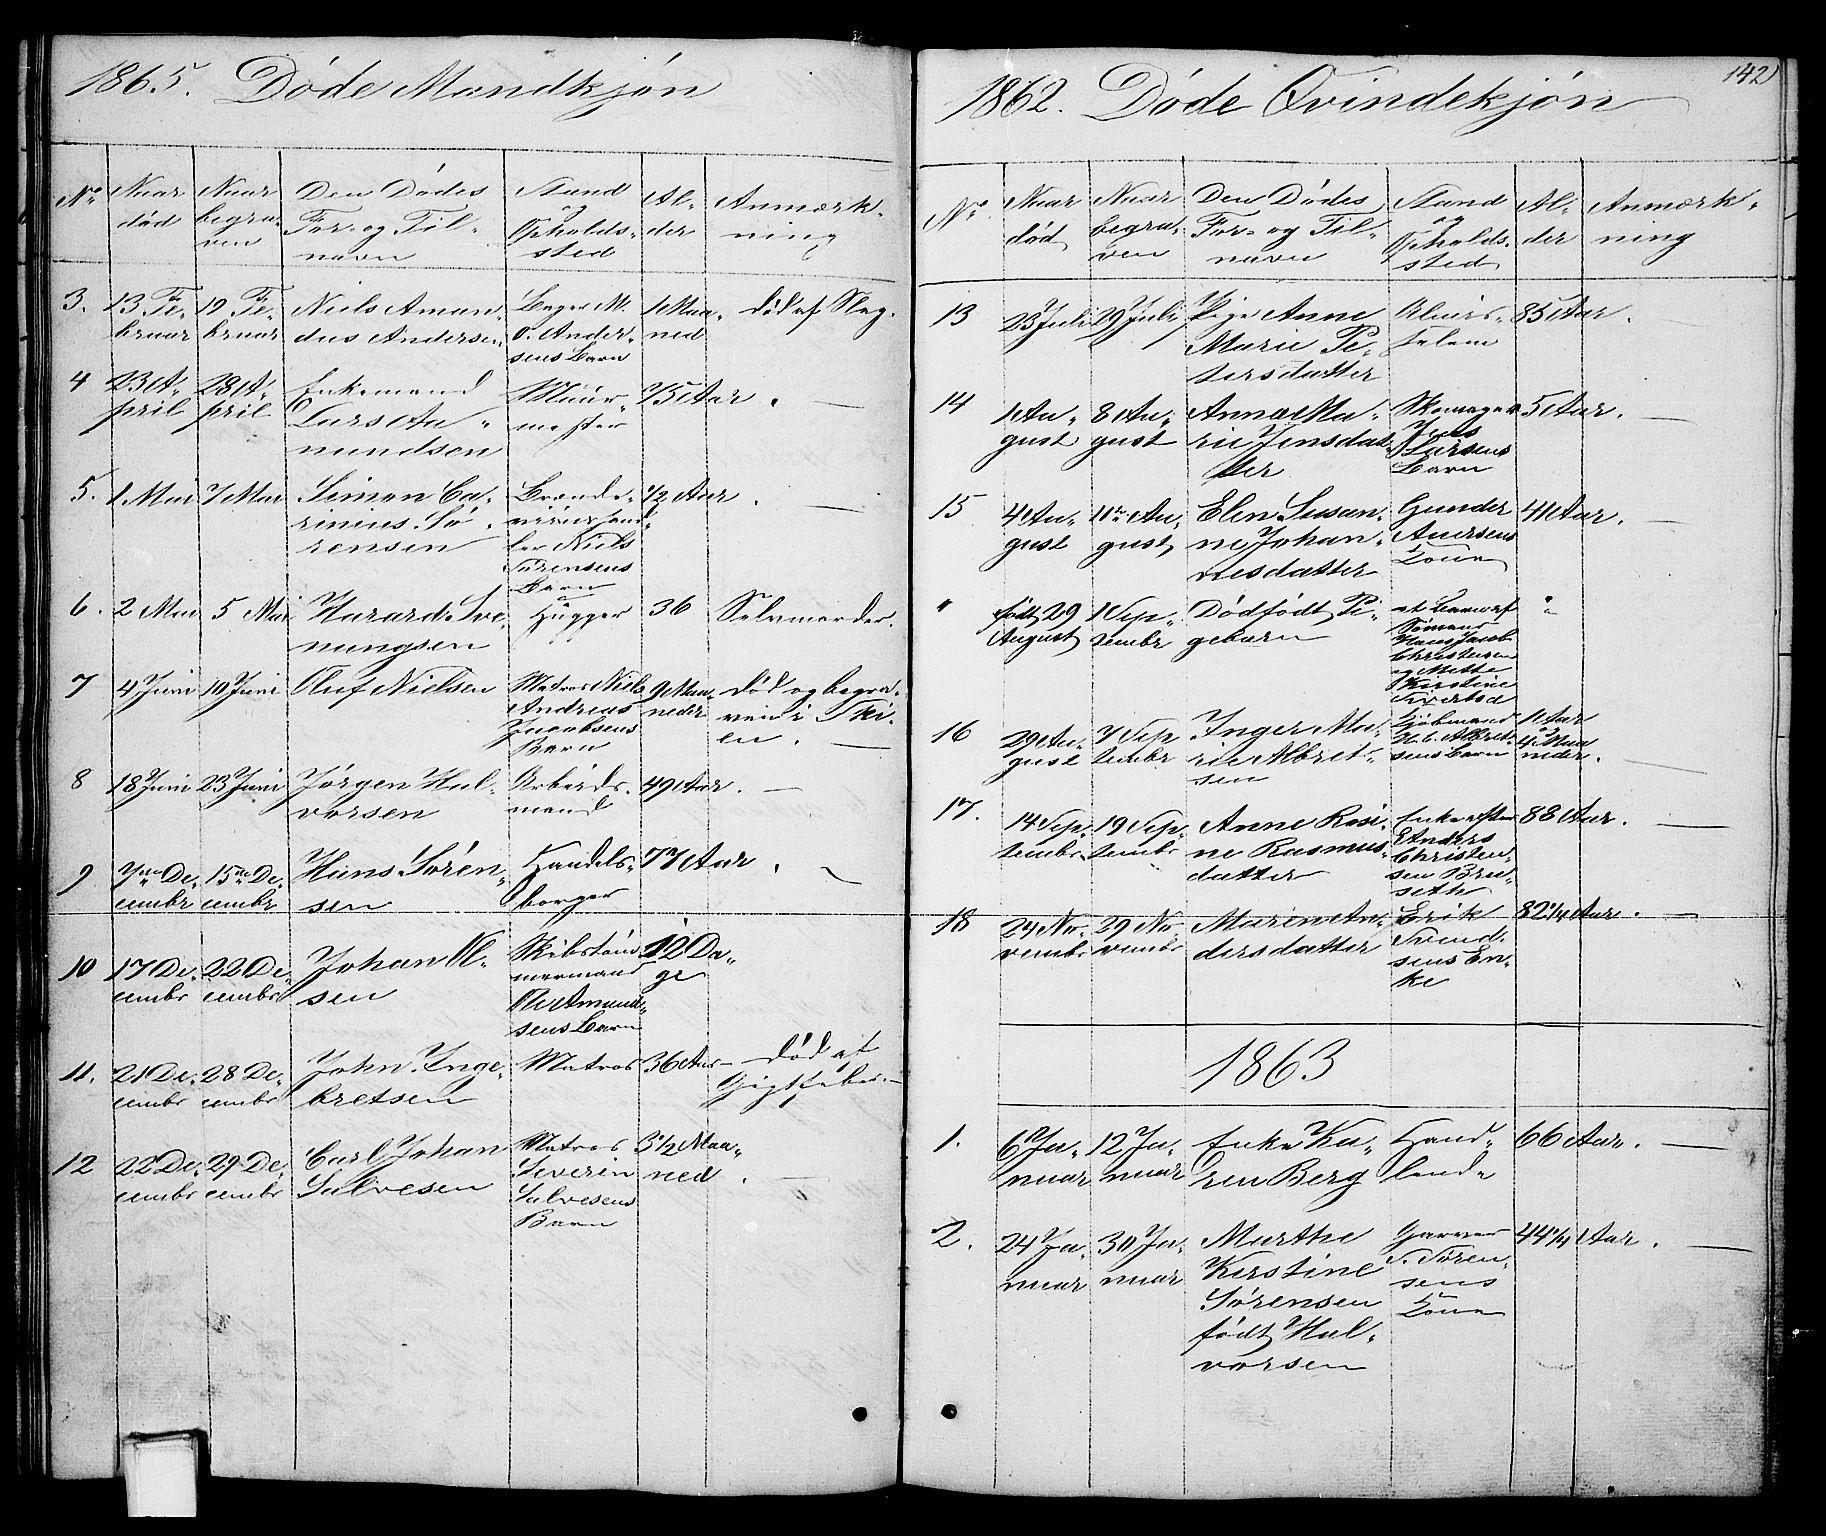 SAKO, Brevik kirkebøker, G/Ga/L0002: Klokkerbok nr. 2, 1846-1865, s. 142